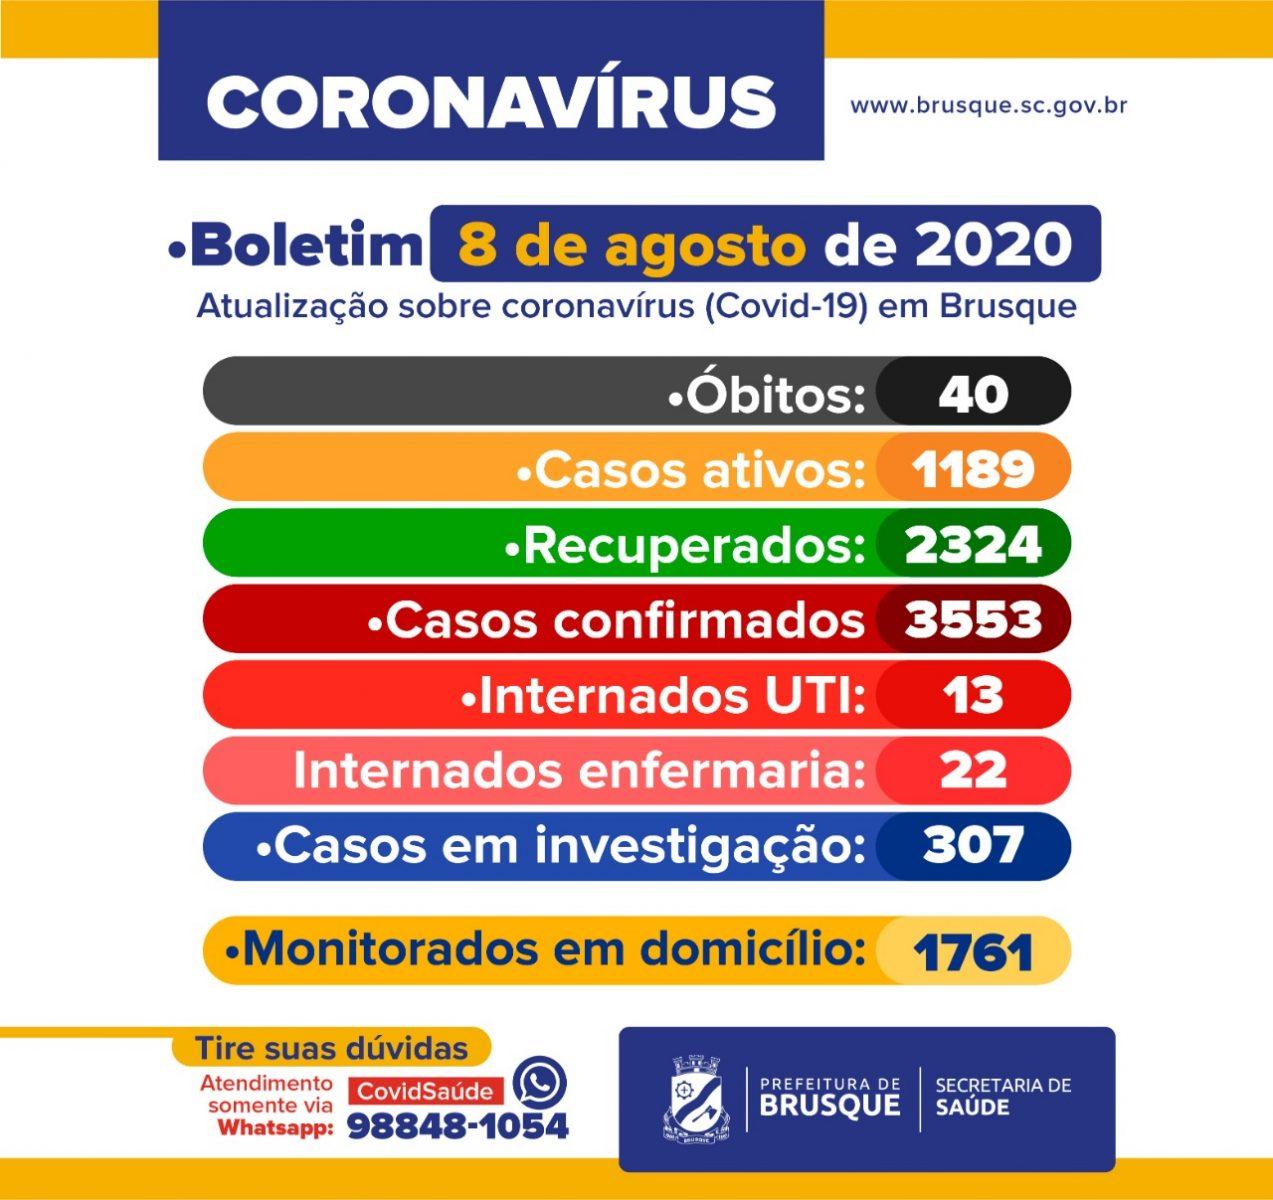 COVID-19: Boletim epidemiológico 8 de agosto